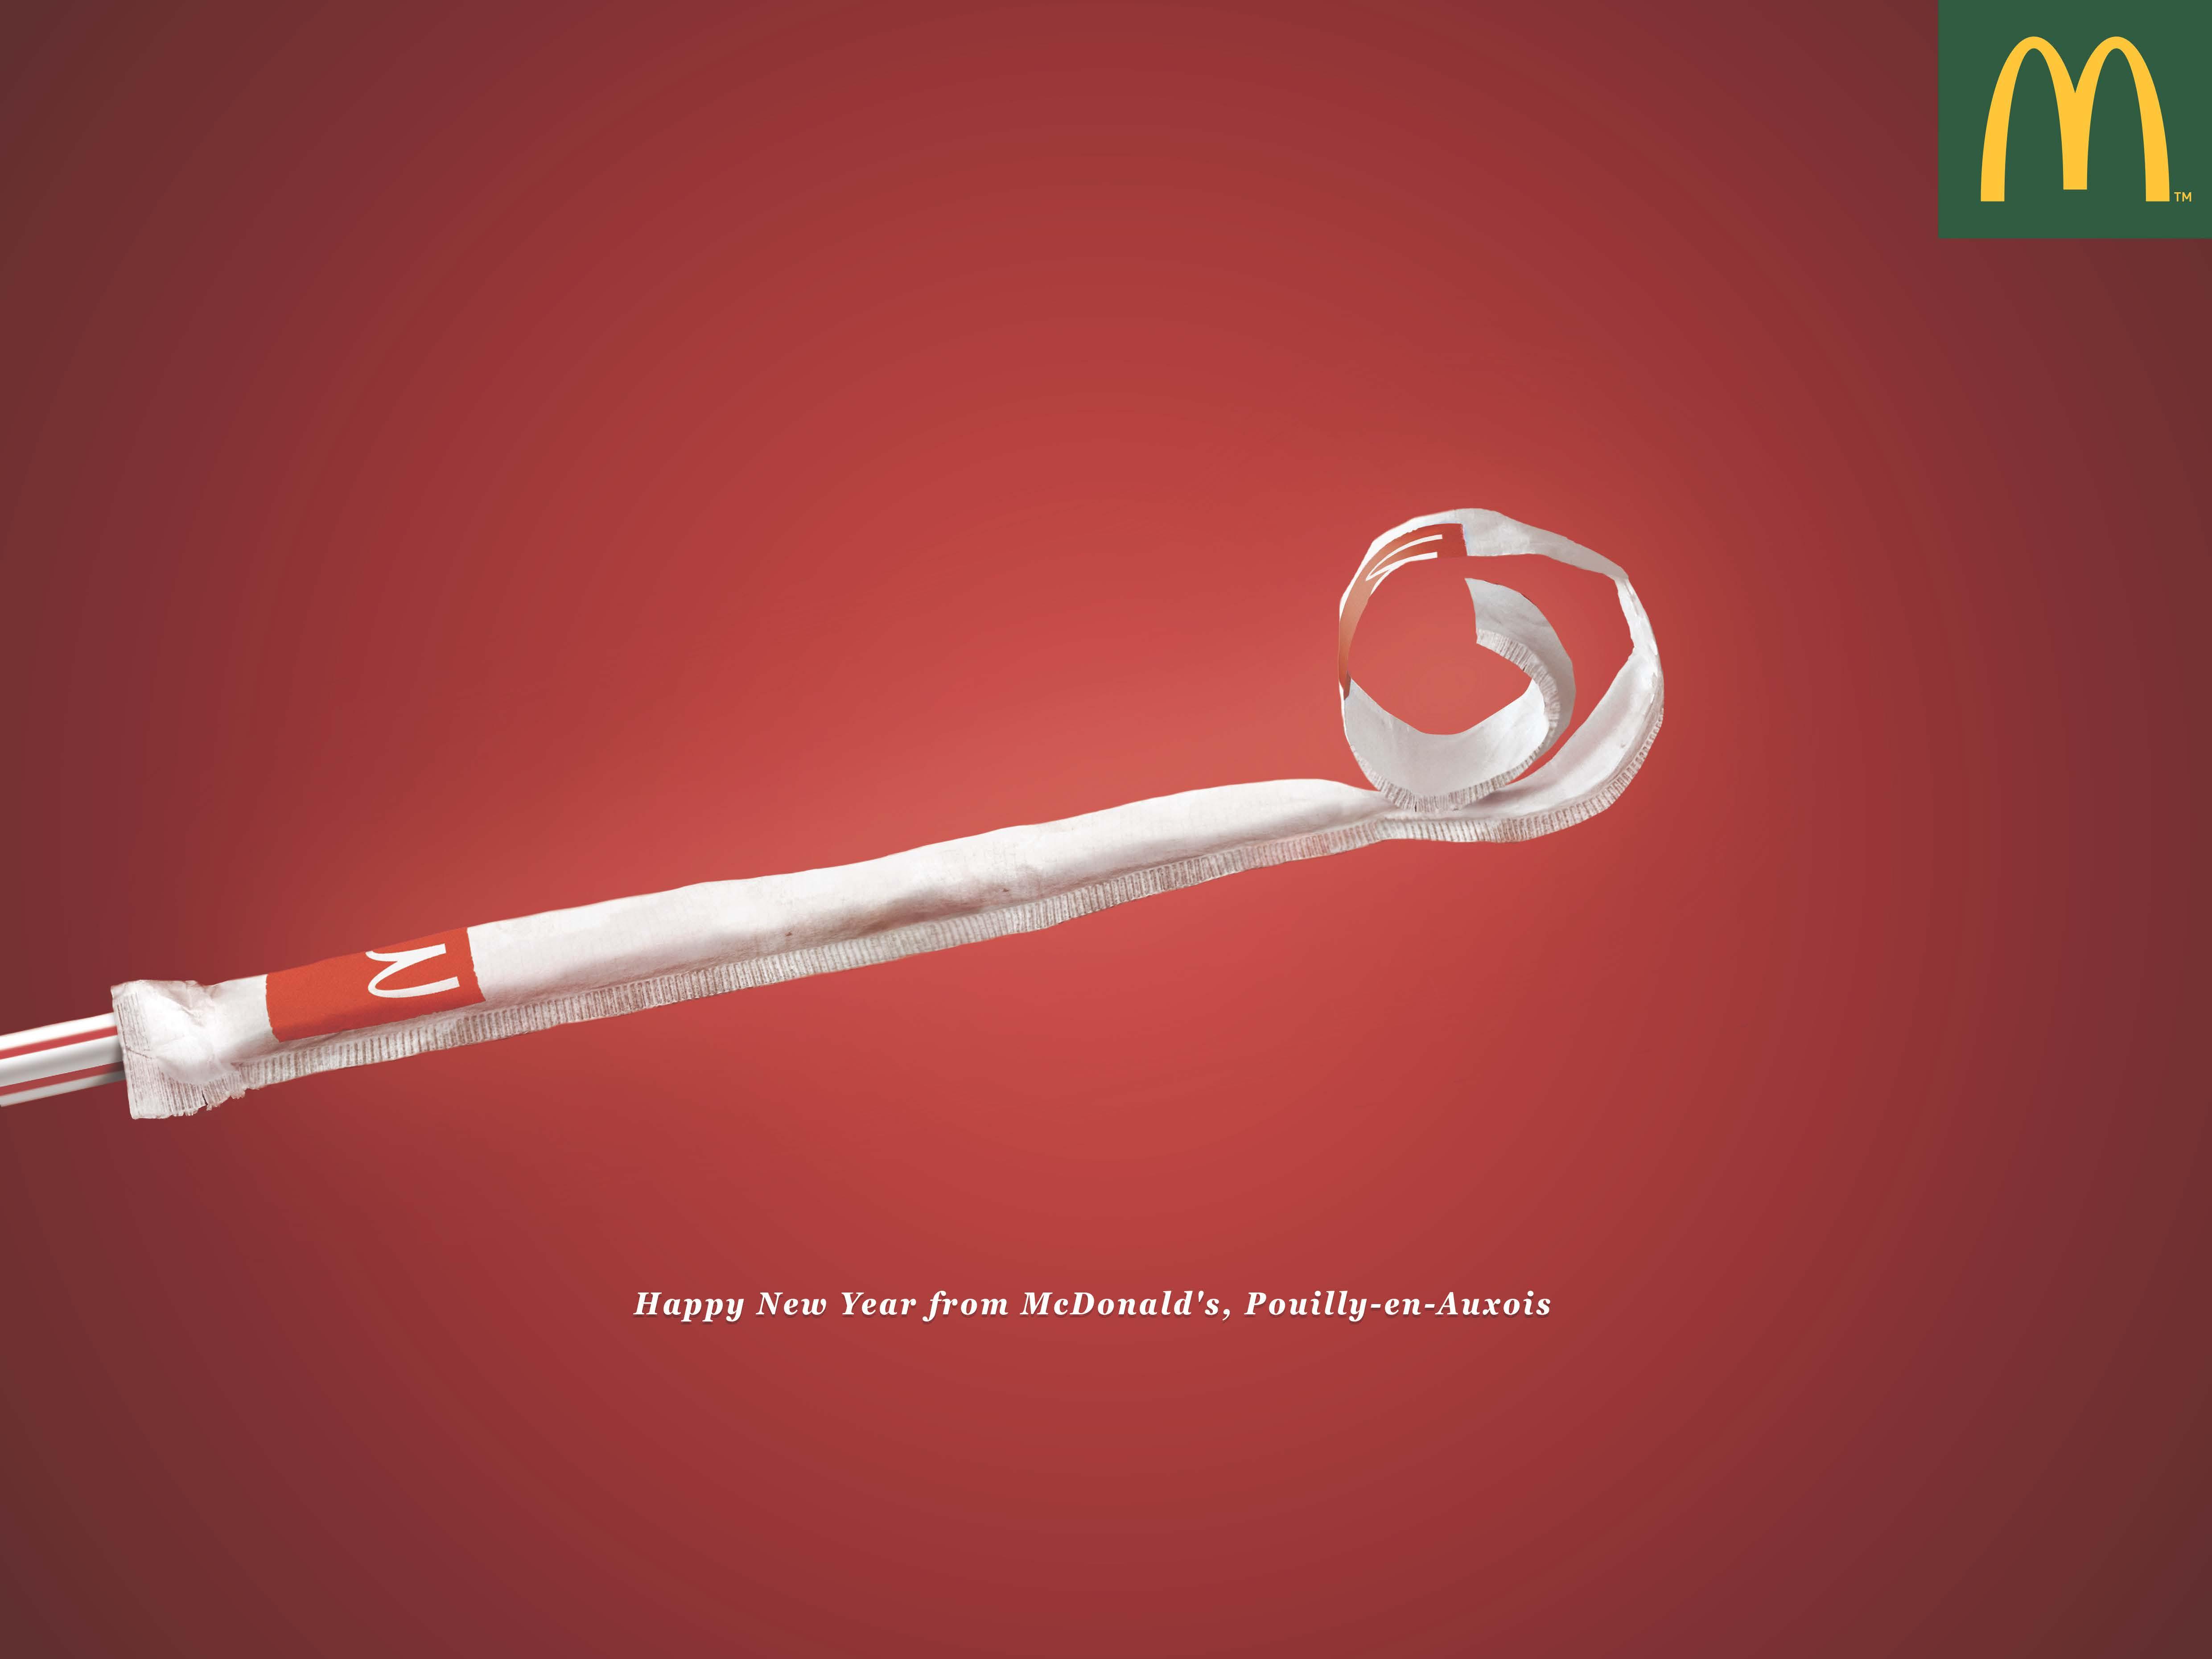 McDonald's straw